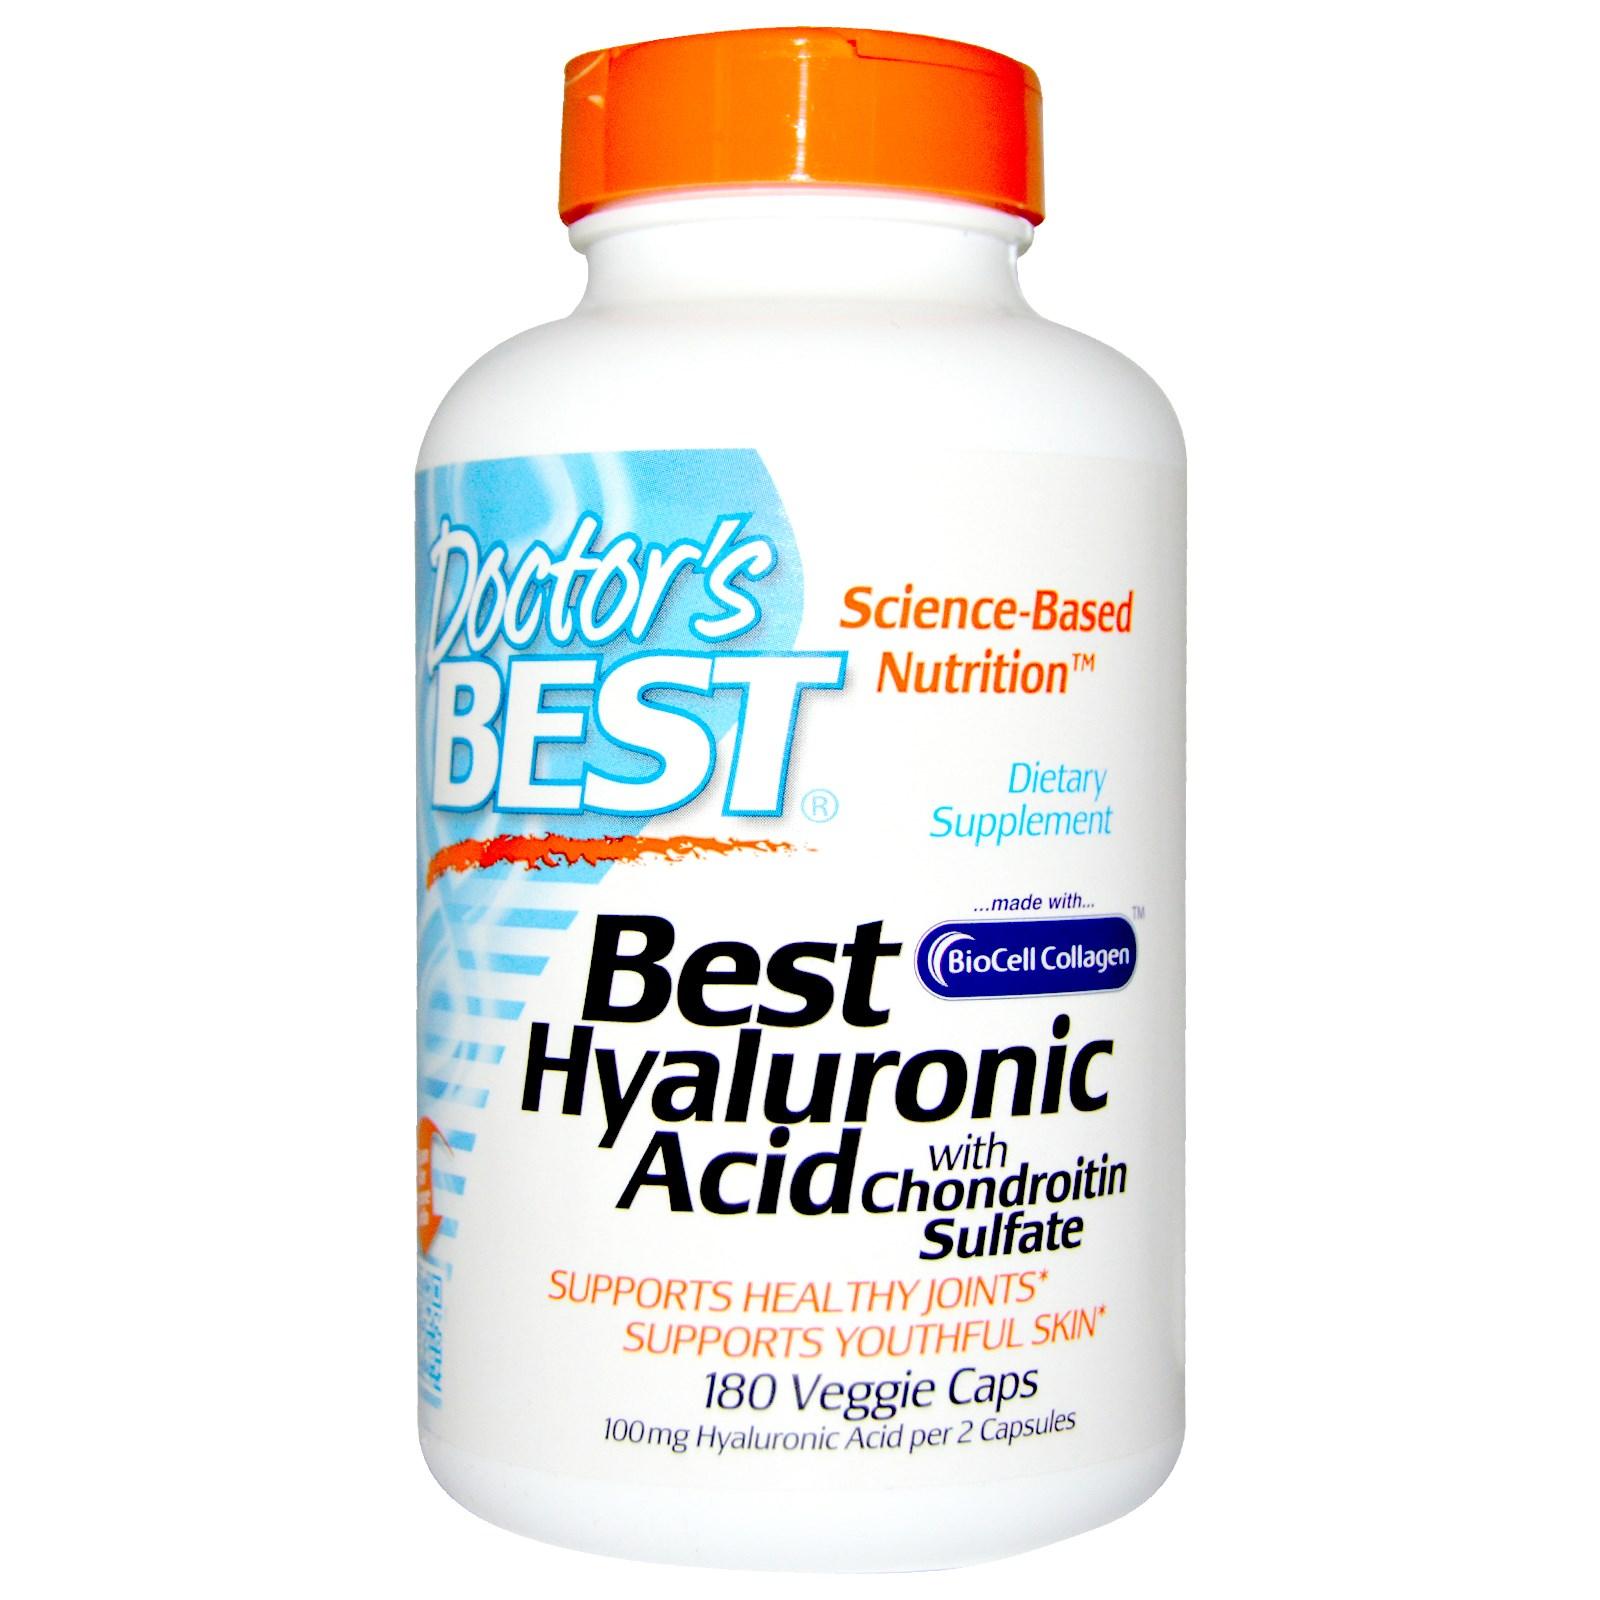 Doctor's Best, Best гиалуроновая кислота с хондроитин сульфатом, 180 капсул